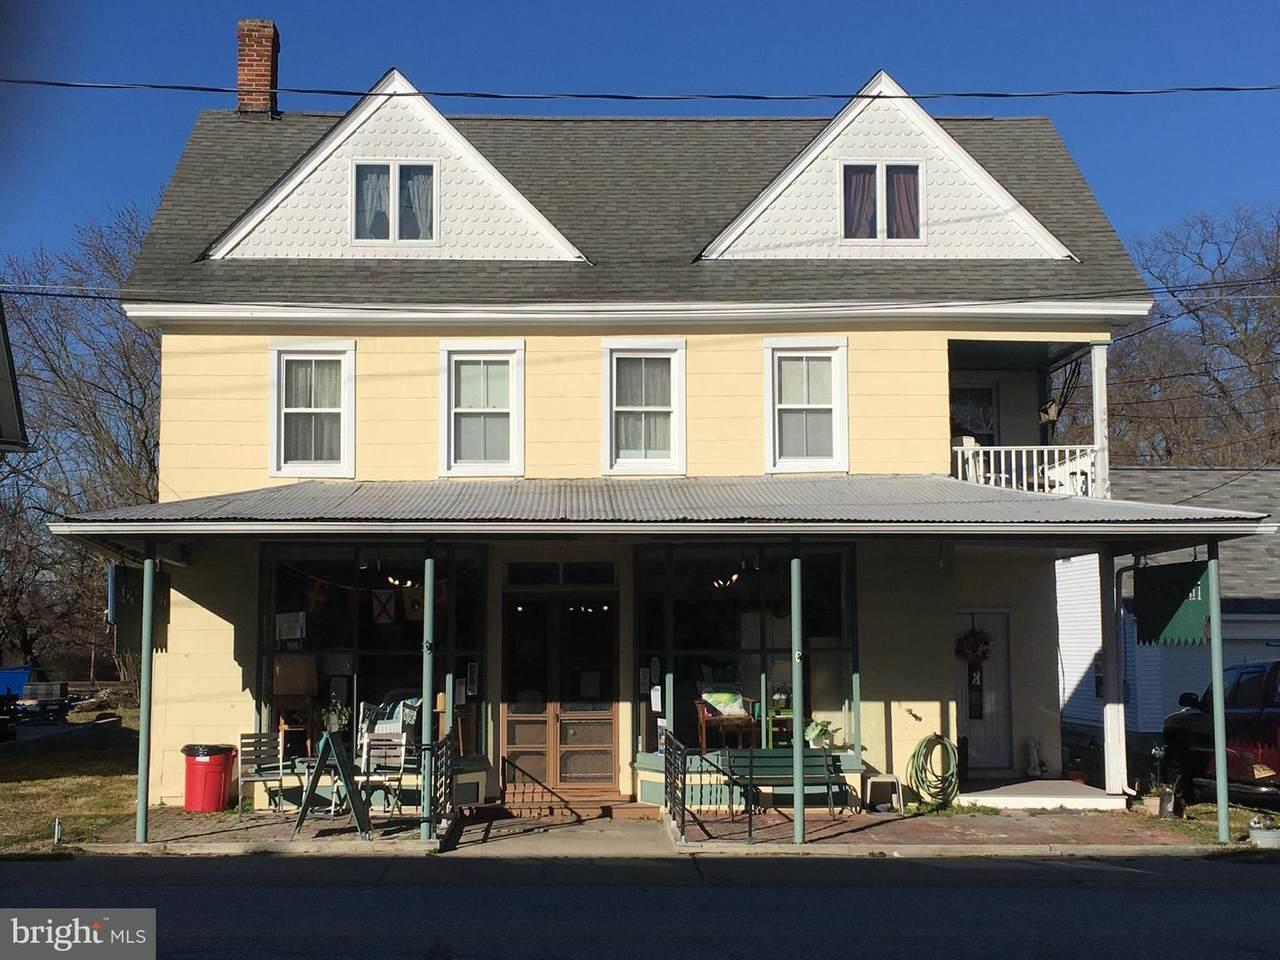 21326 Sharp Street - Photo 1